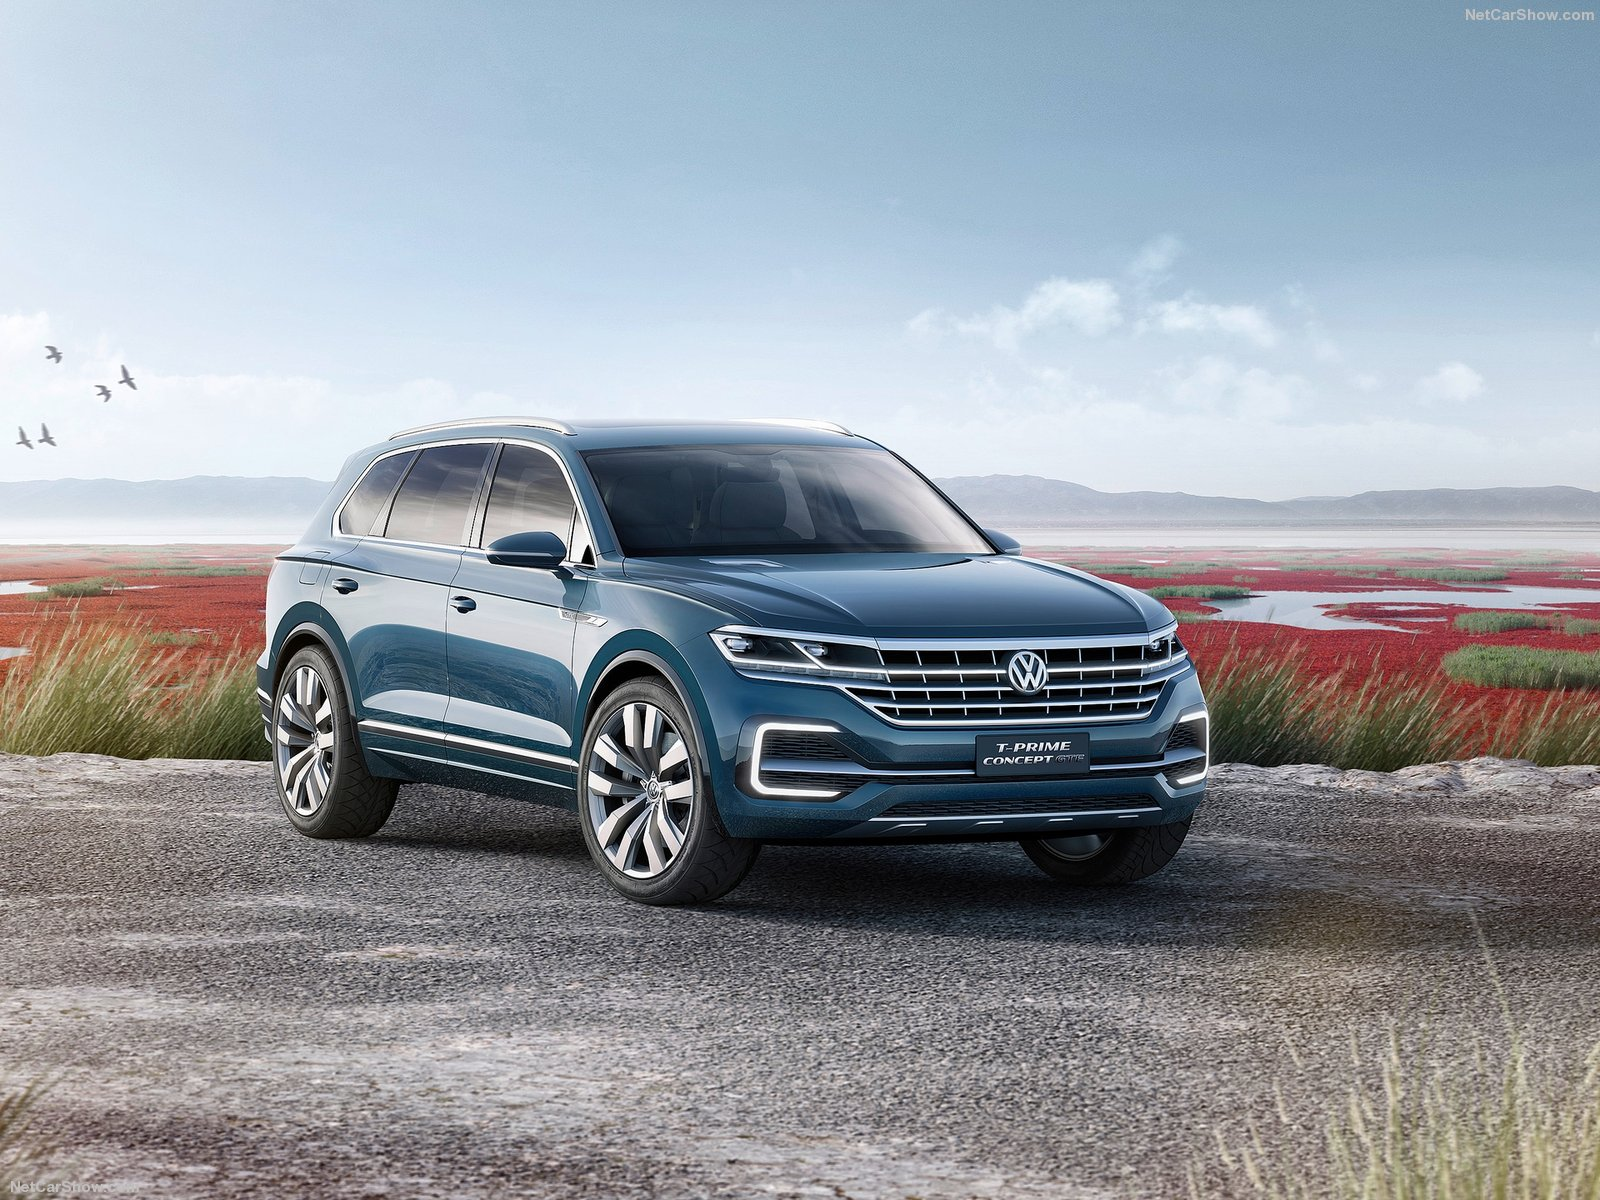 Volkswagen-T-Prime_GTE_Concept-2016-1600-09